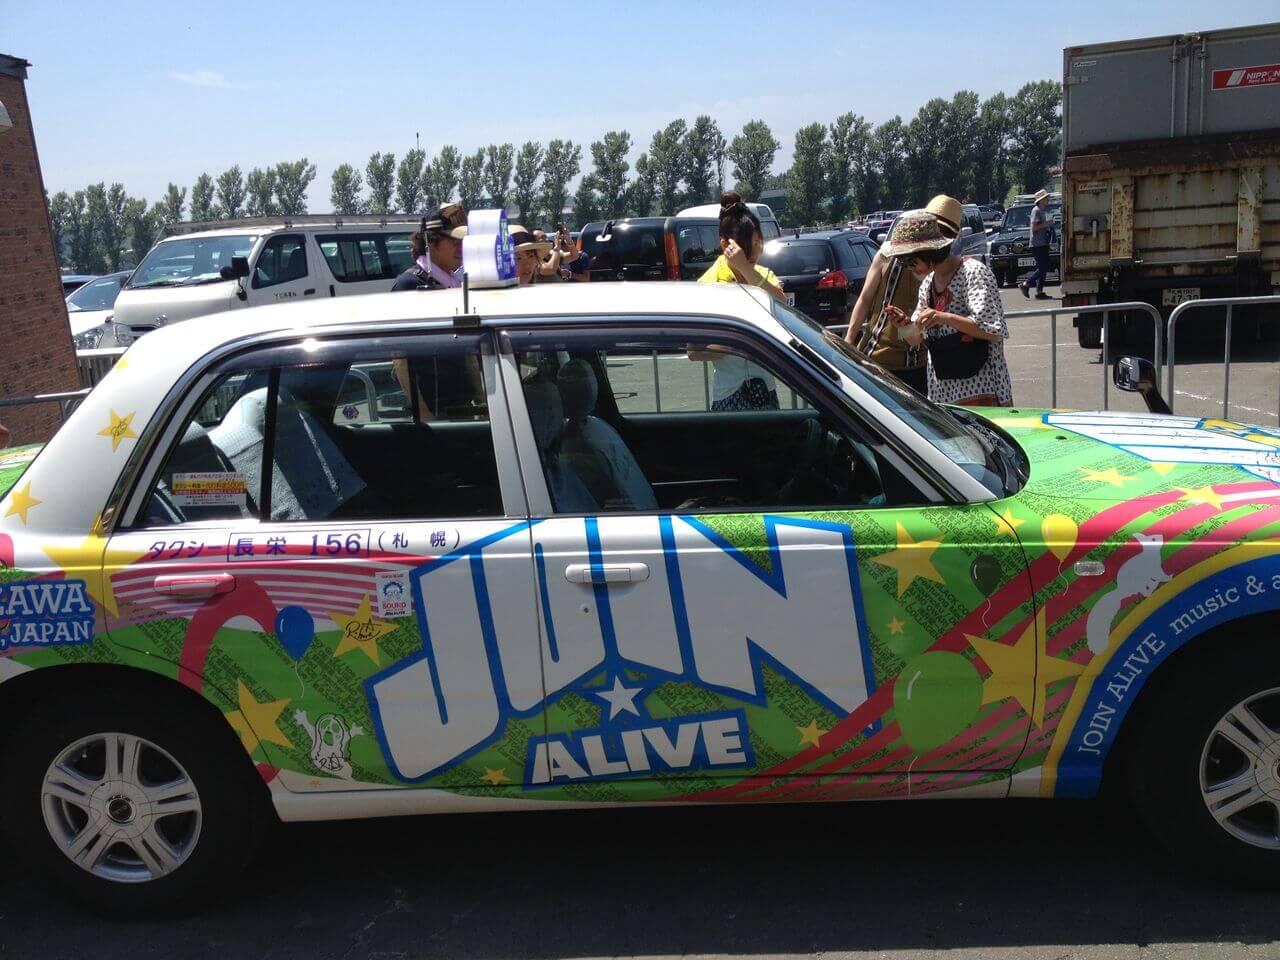 JOIN ALIVEタクシー。かわいい。